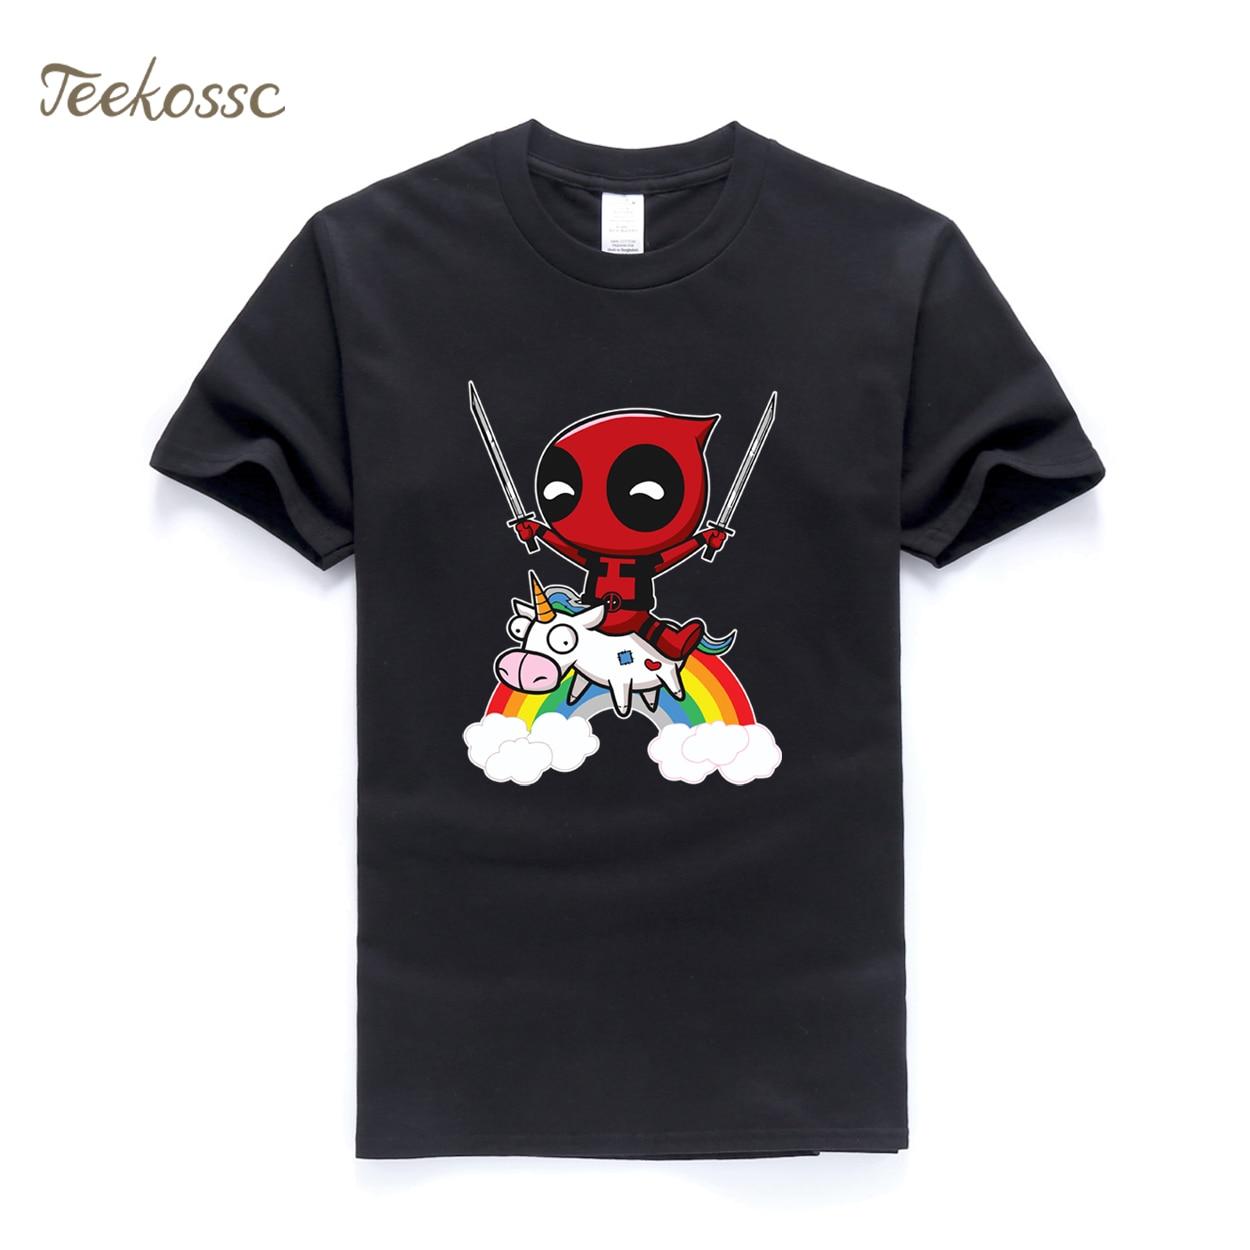 Deadpool Men T Shirt Funny Tshirt 2018 Summer Top Tee Hipster Mens T Shirts 100% Cotton Dead Pool T-Shirt Brand Clothing